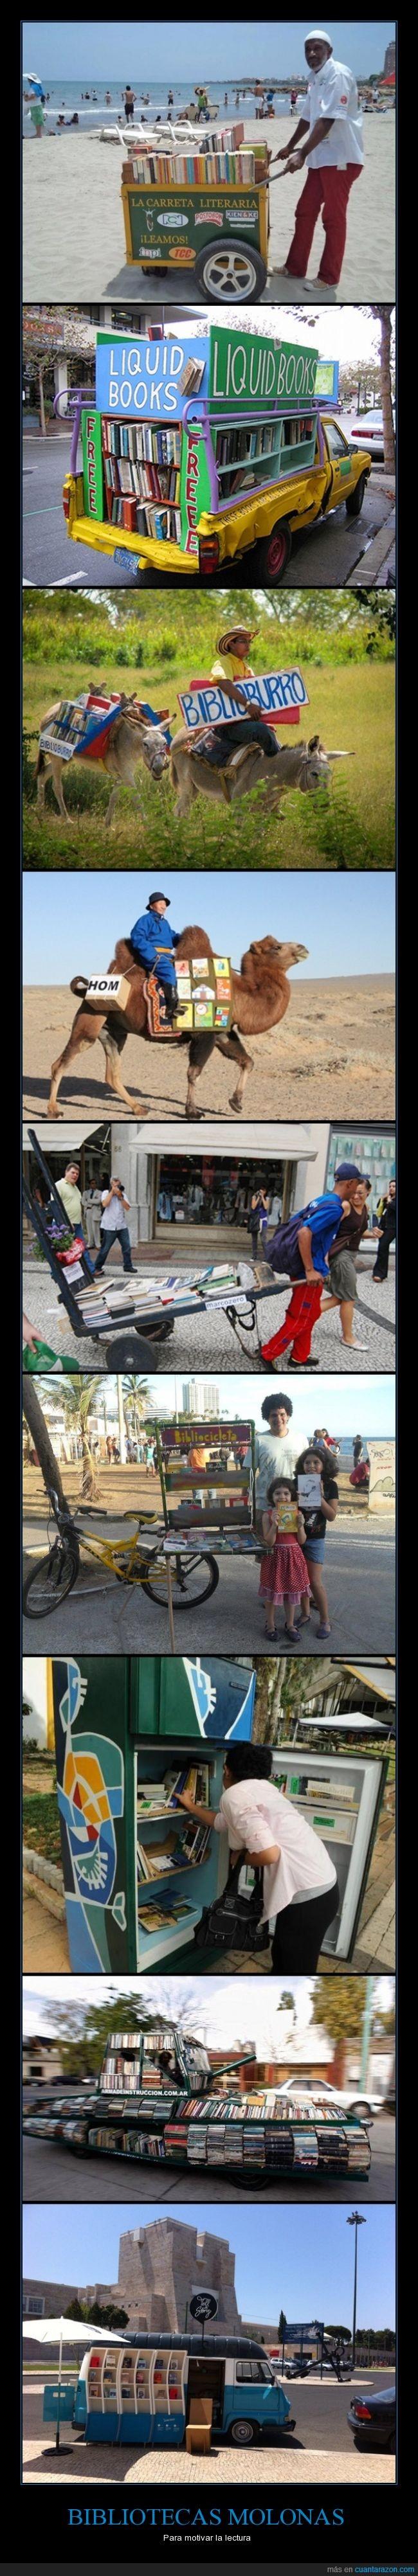 ambulante,ambulantes,biblioteca,furgoneta,itinerante,libreria,libro